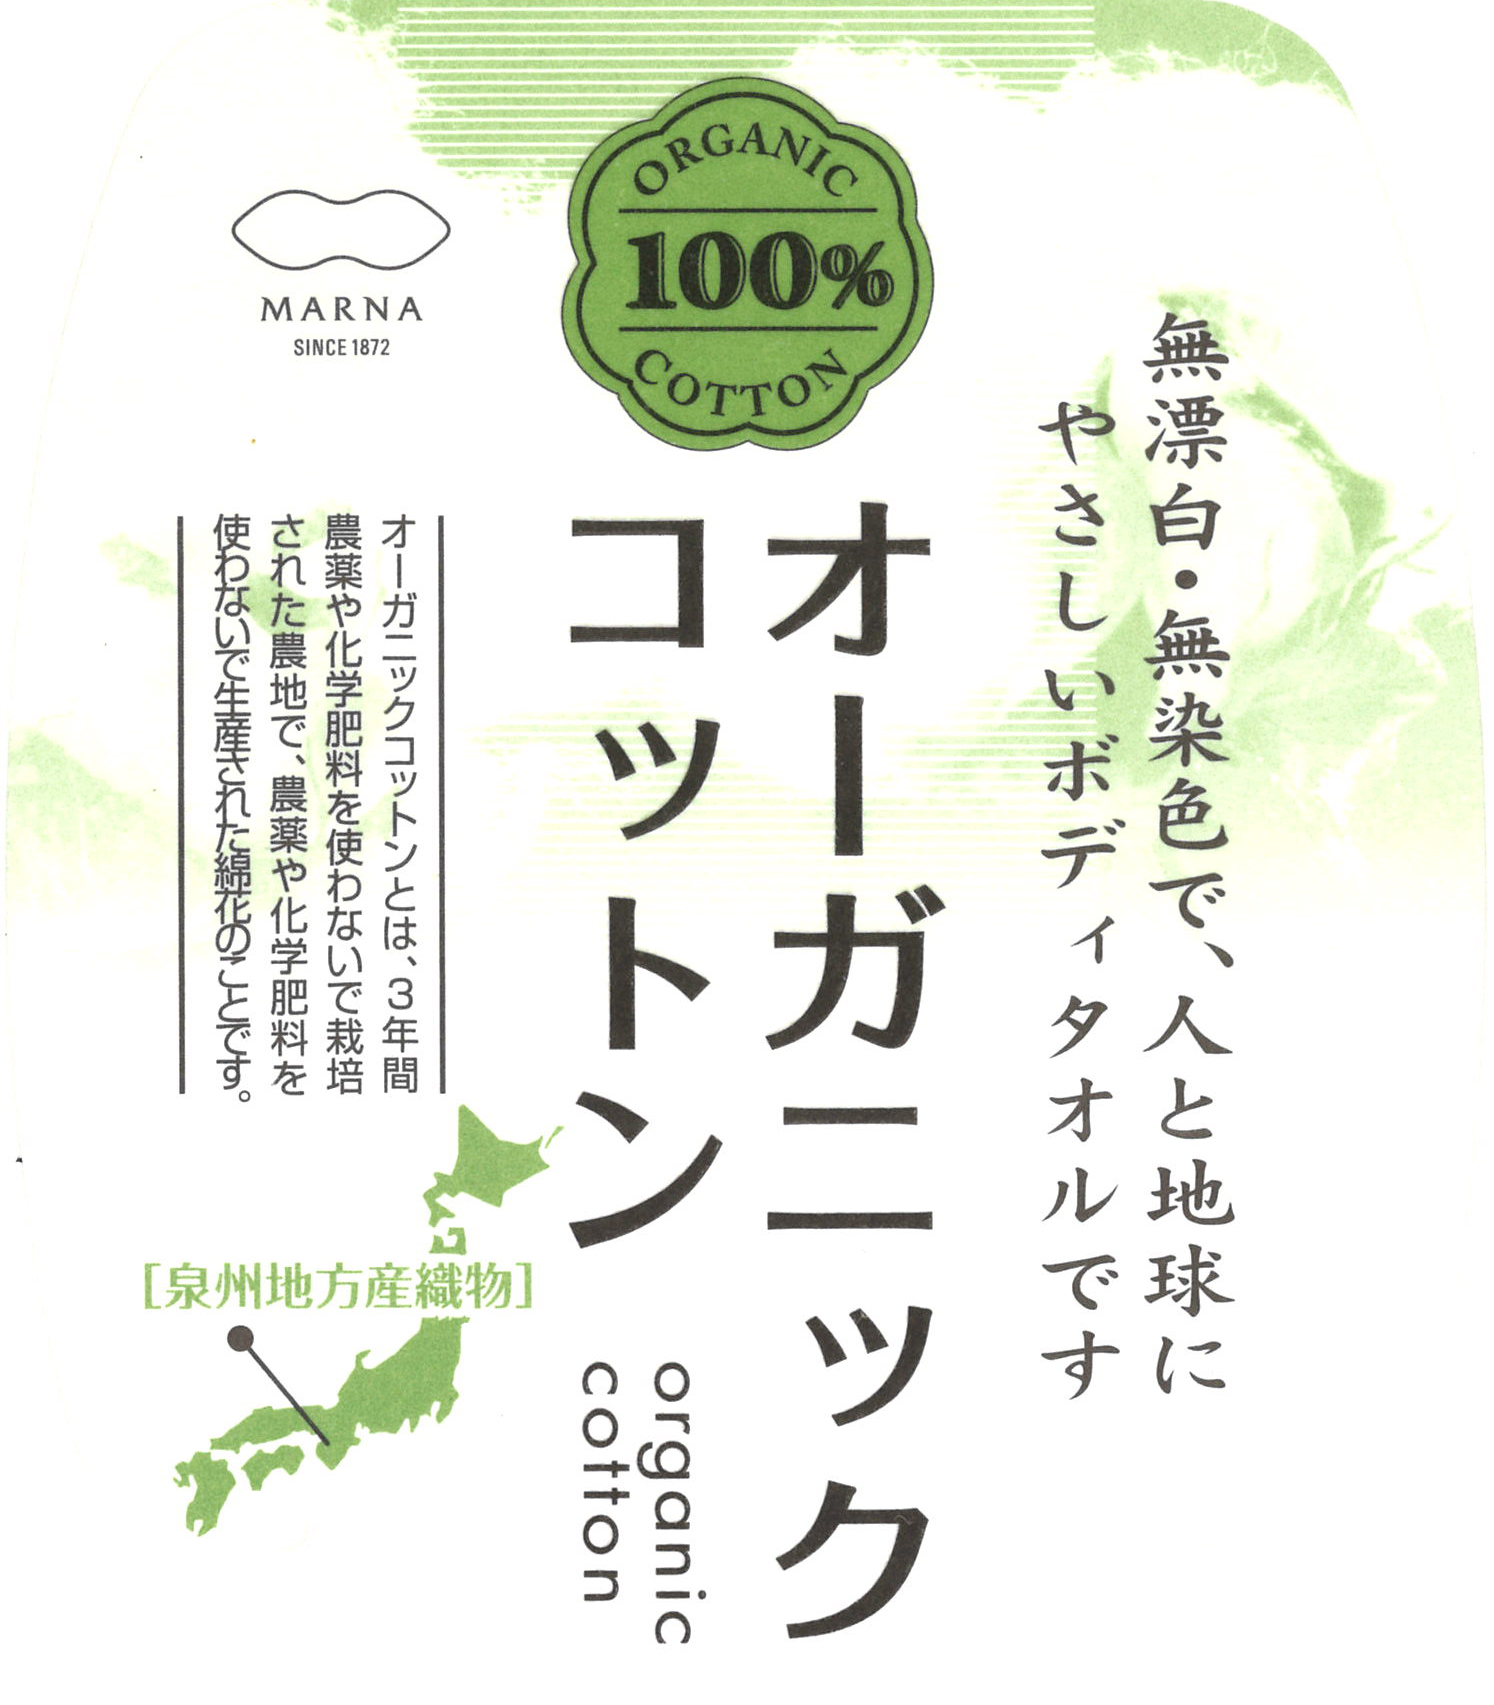 Marna Organic Towel